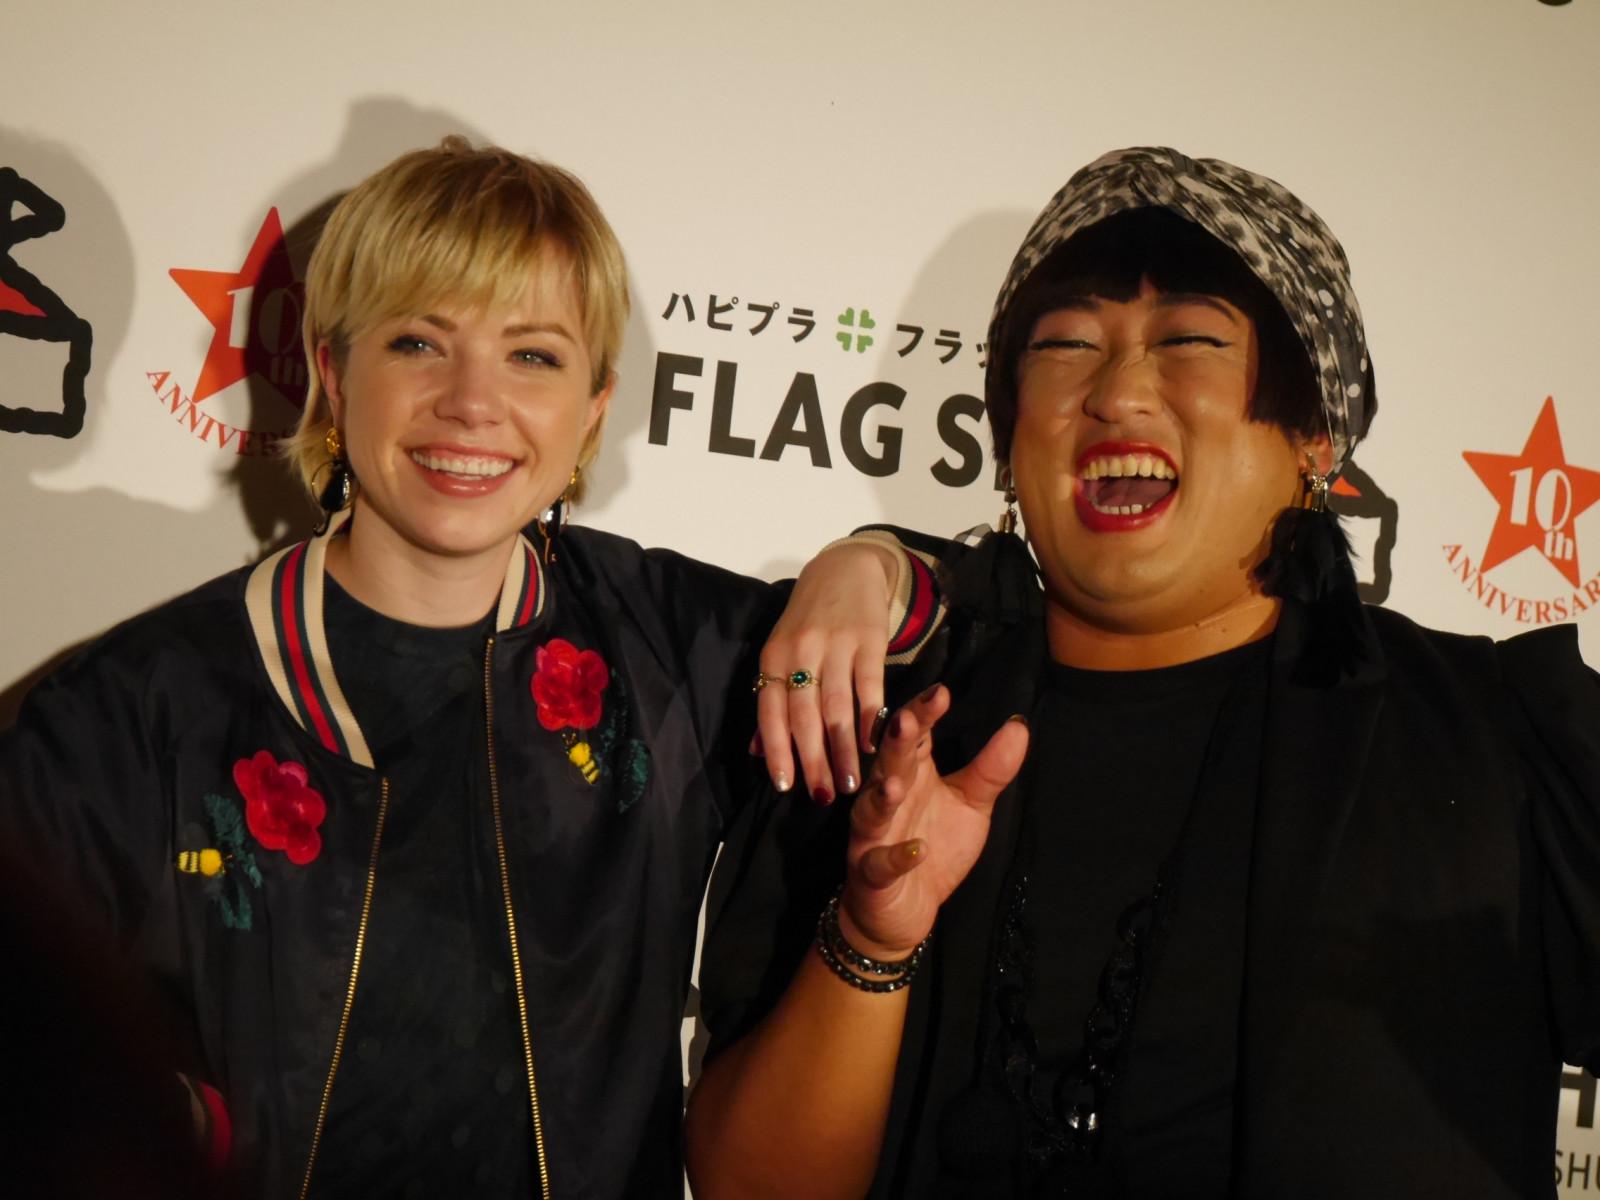 FLAG SHOPの10周年記念イベントにカーリー・レイ・ジェプセンとYOKO FUCHIGAMIがゲストで登場!